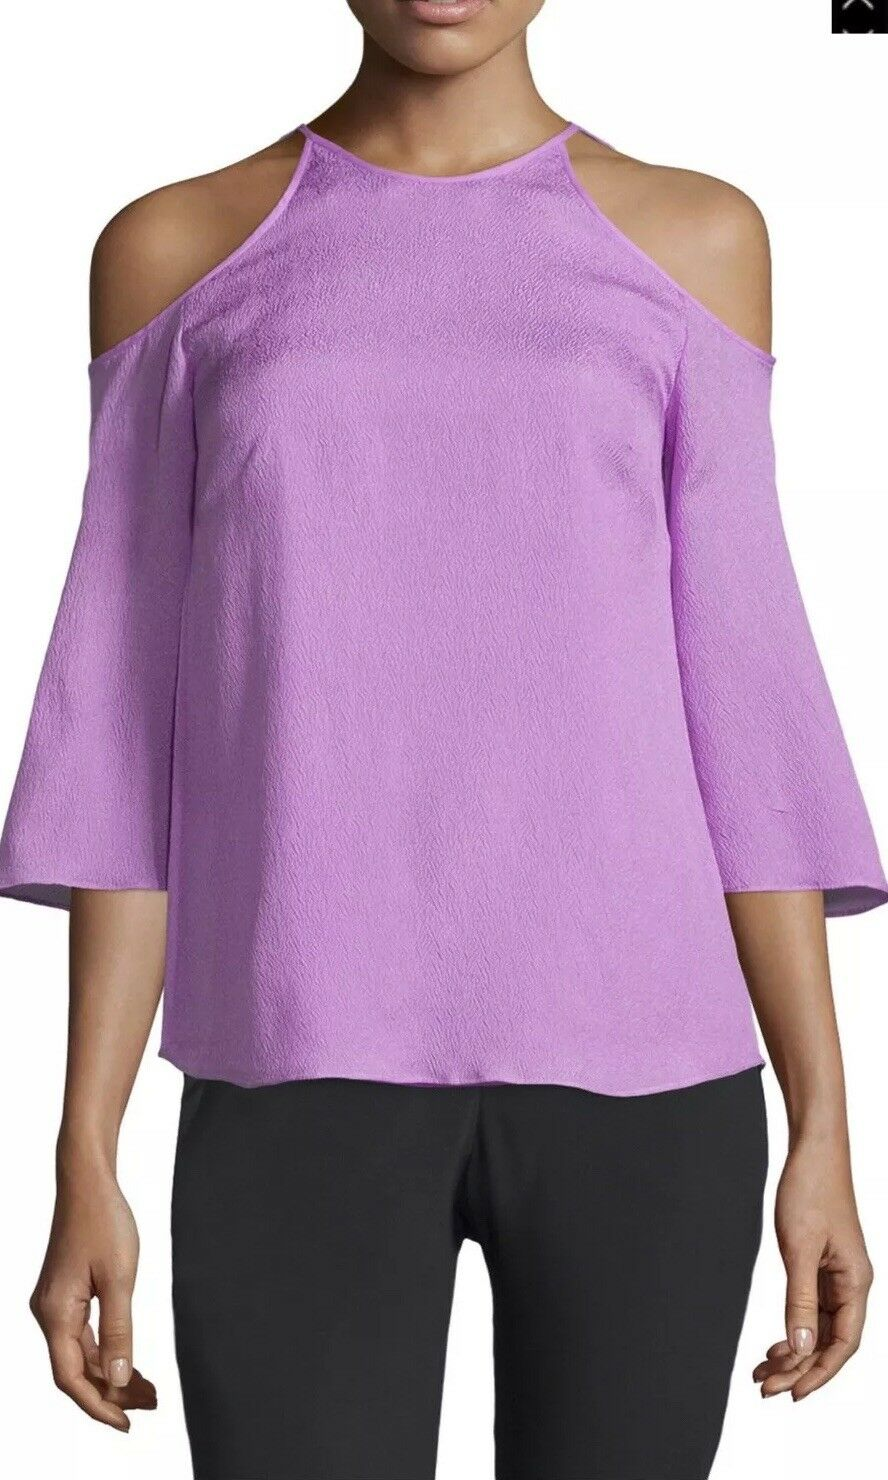 NWT damen Halston Heritage SILK 3 4 Sleeve Cold Shoulder Blouse Top Sz 12